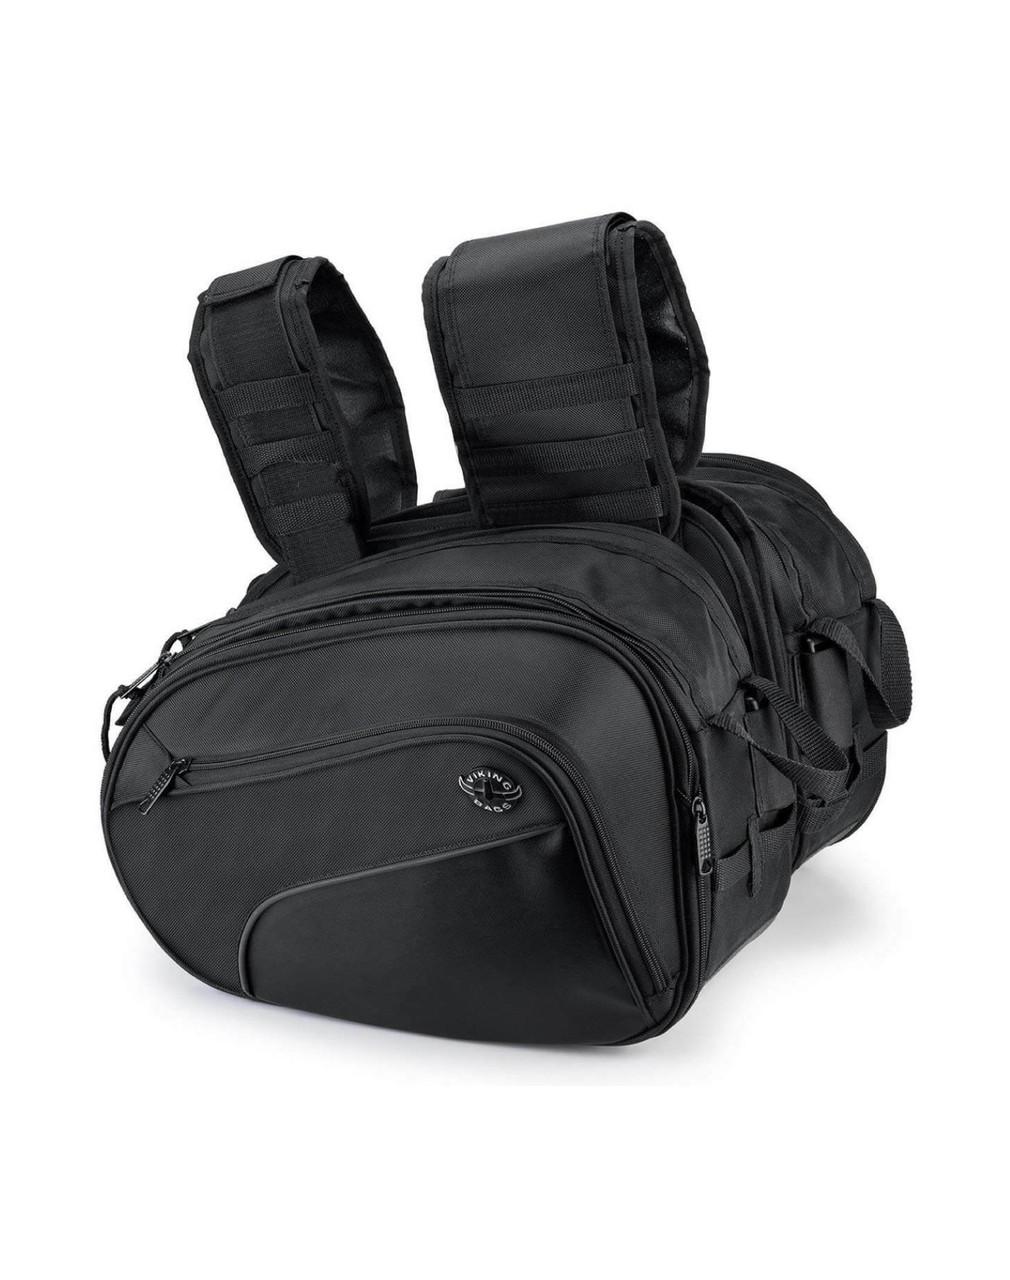 Viking AXE Medium Black Street/Sportbike Saddlebags Both Bags View